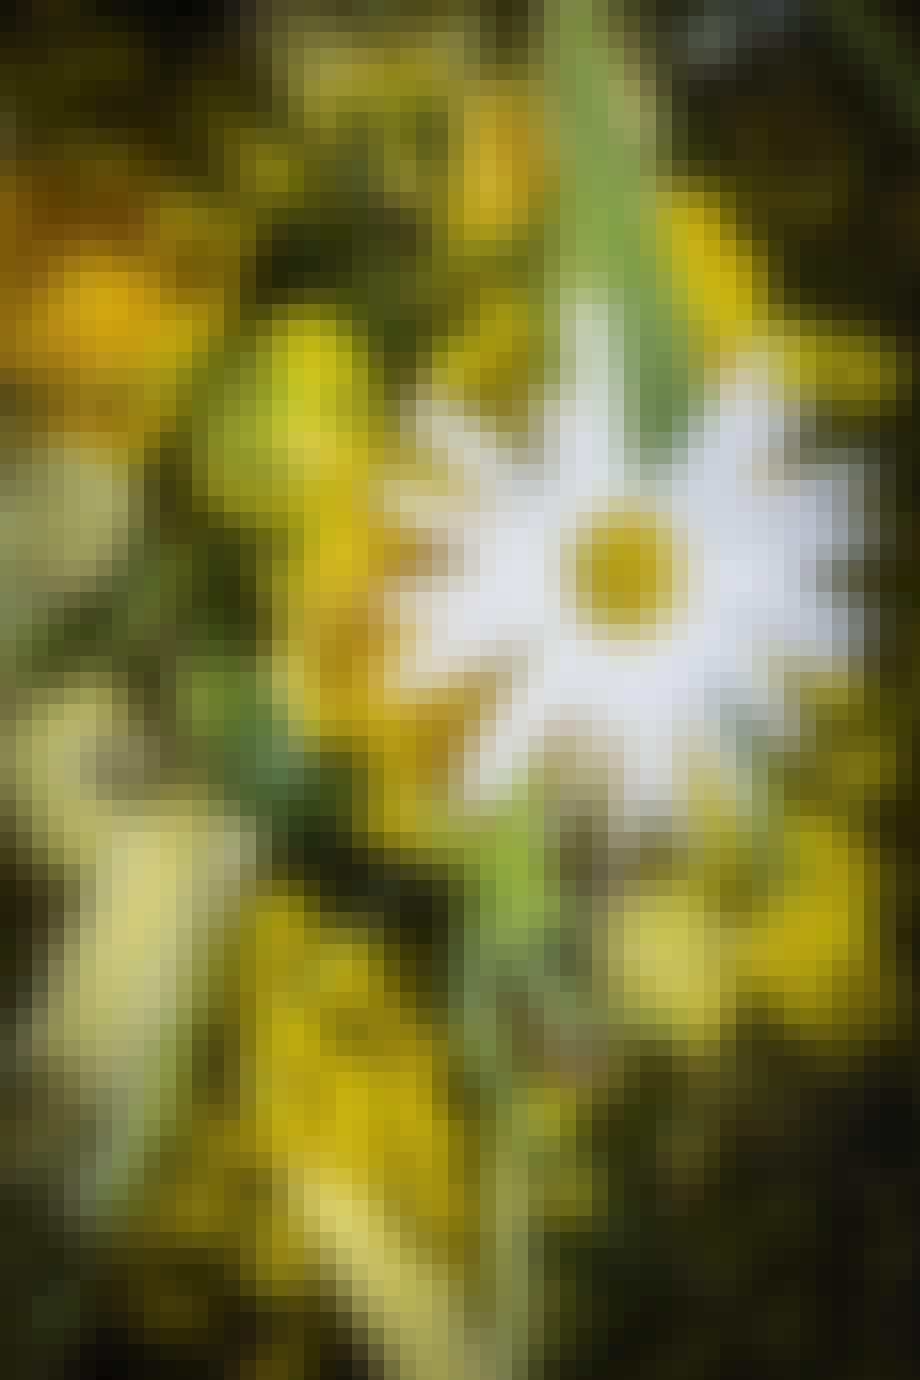 blomsterkrans til påskebordet med påskeæg og marguerite